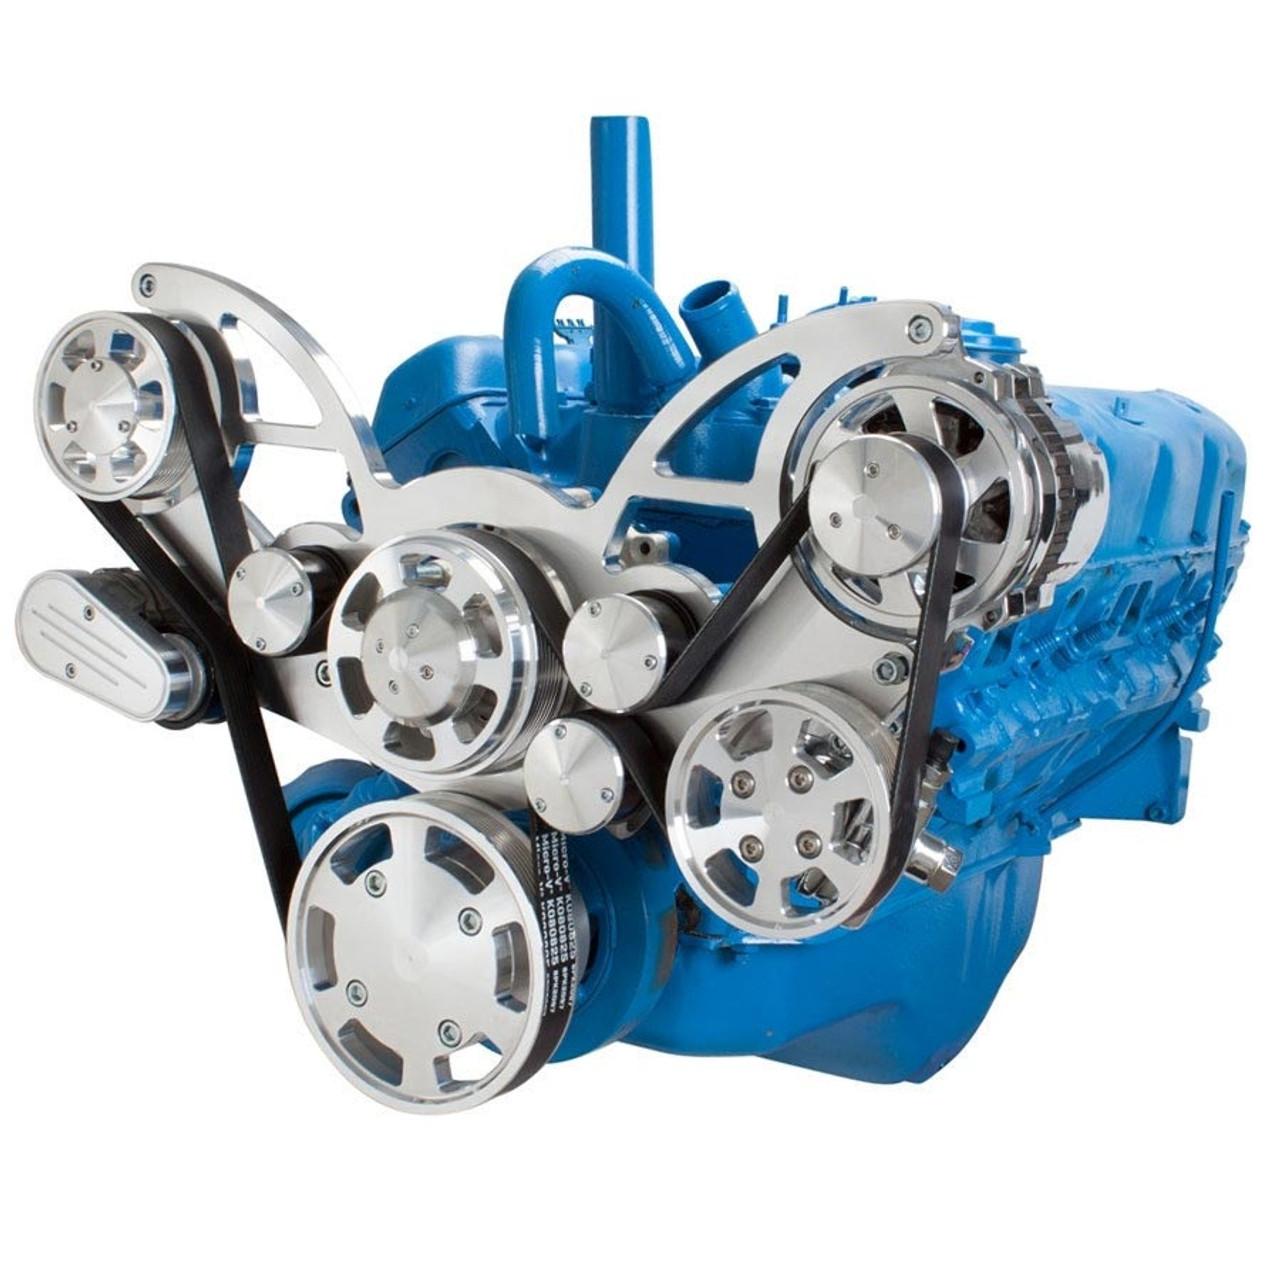 serpentine conversion kit for amc jeep with power steering alternator rh cvfracing com